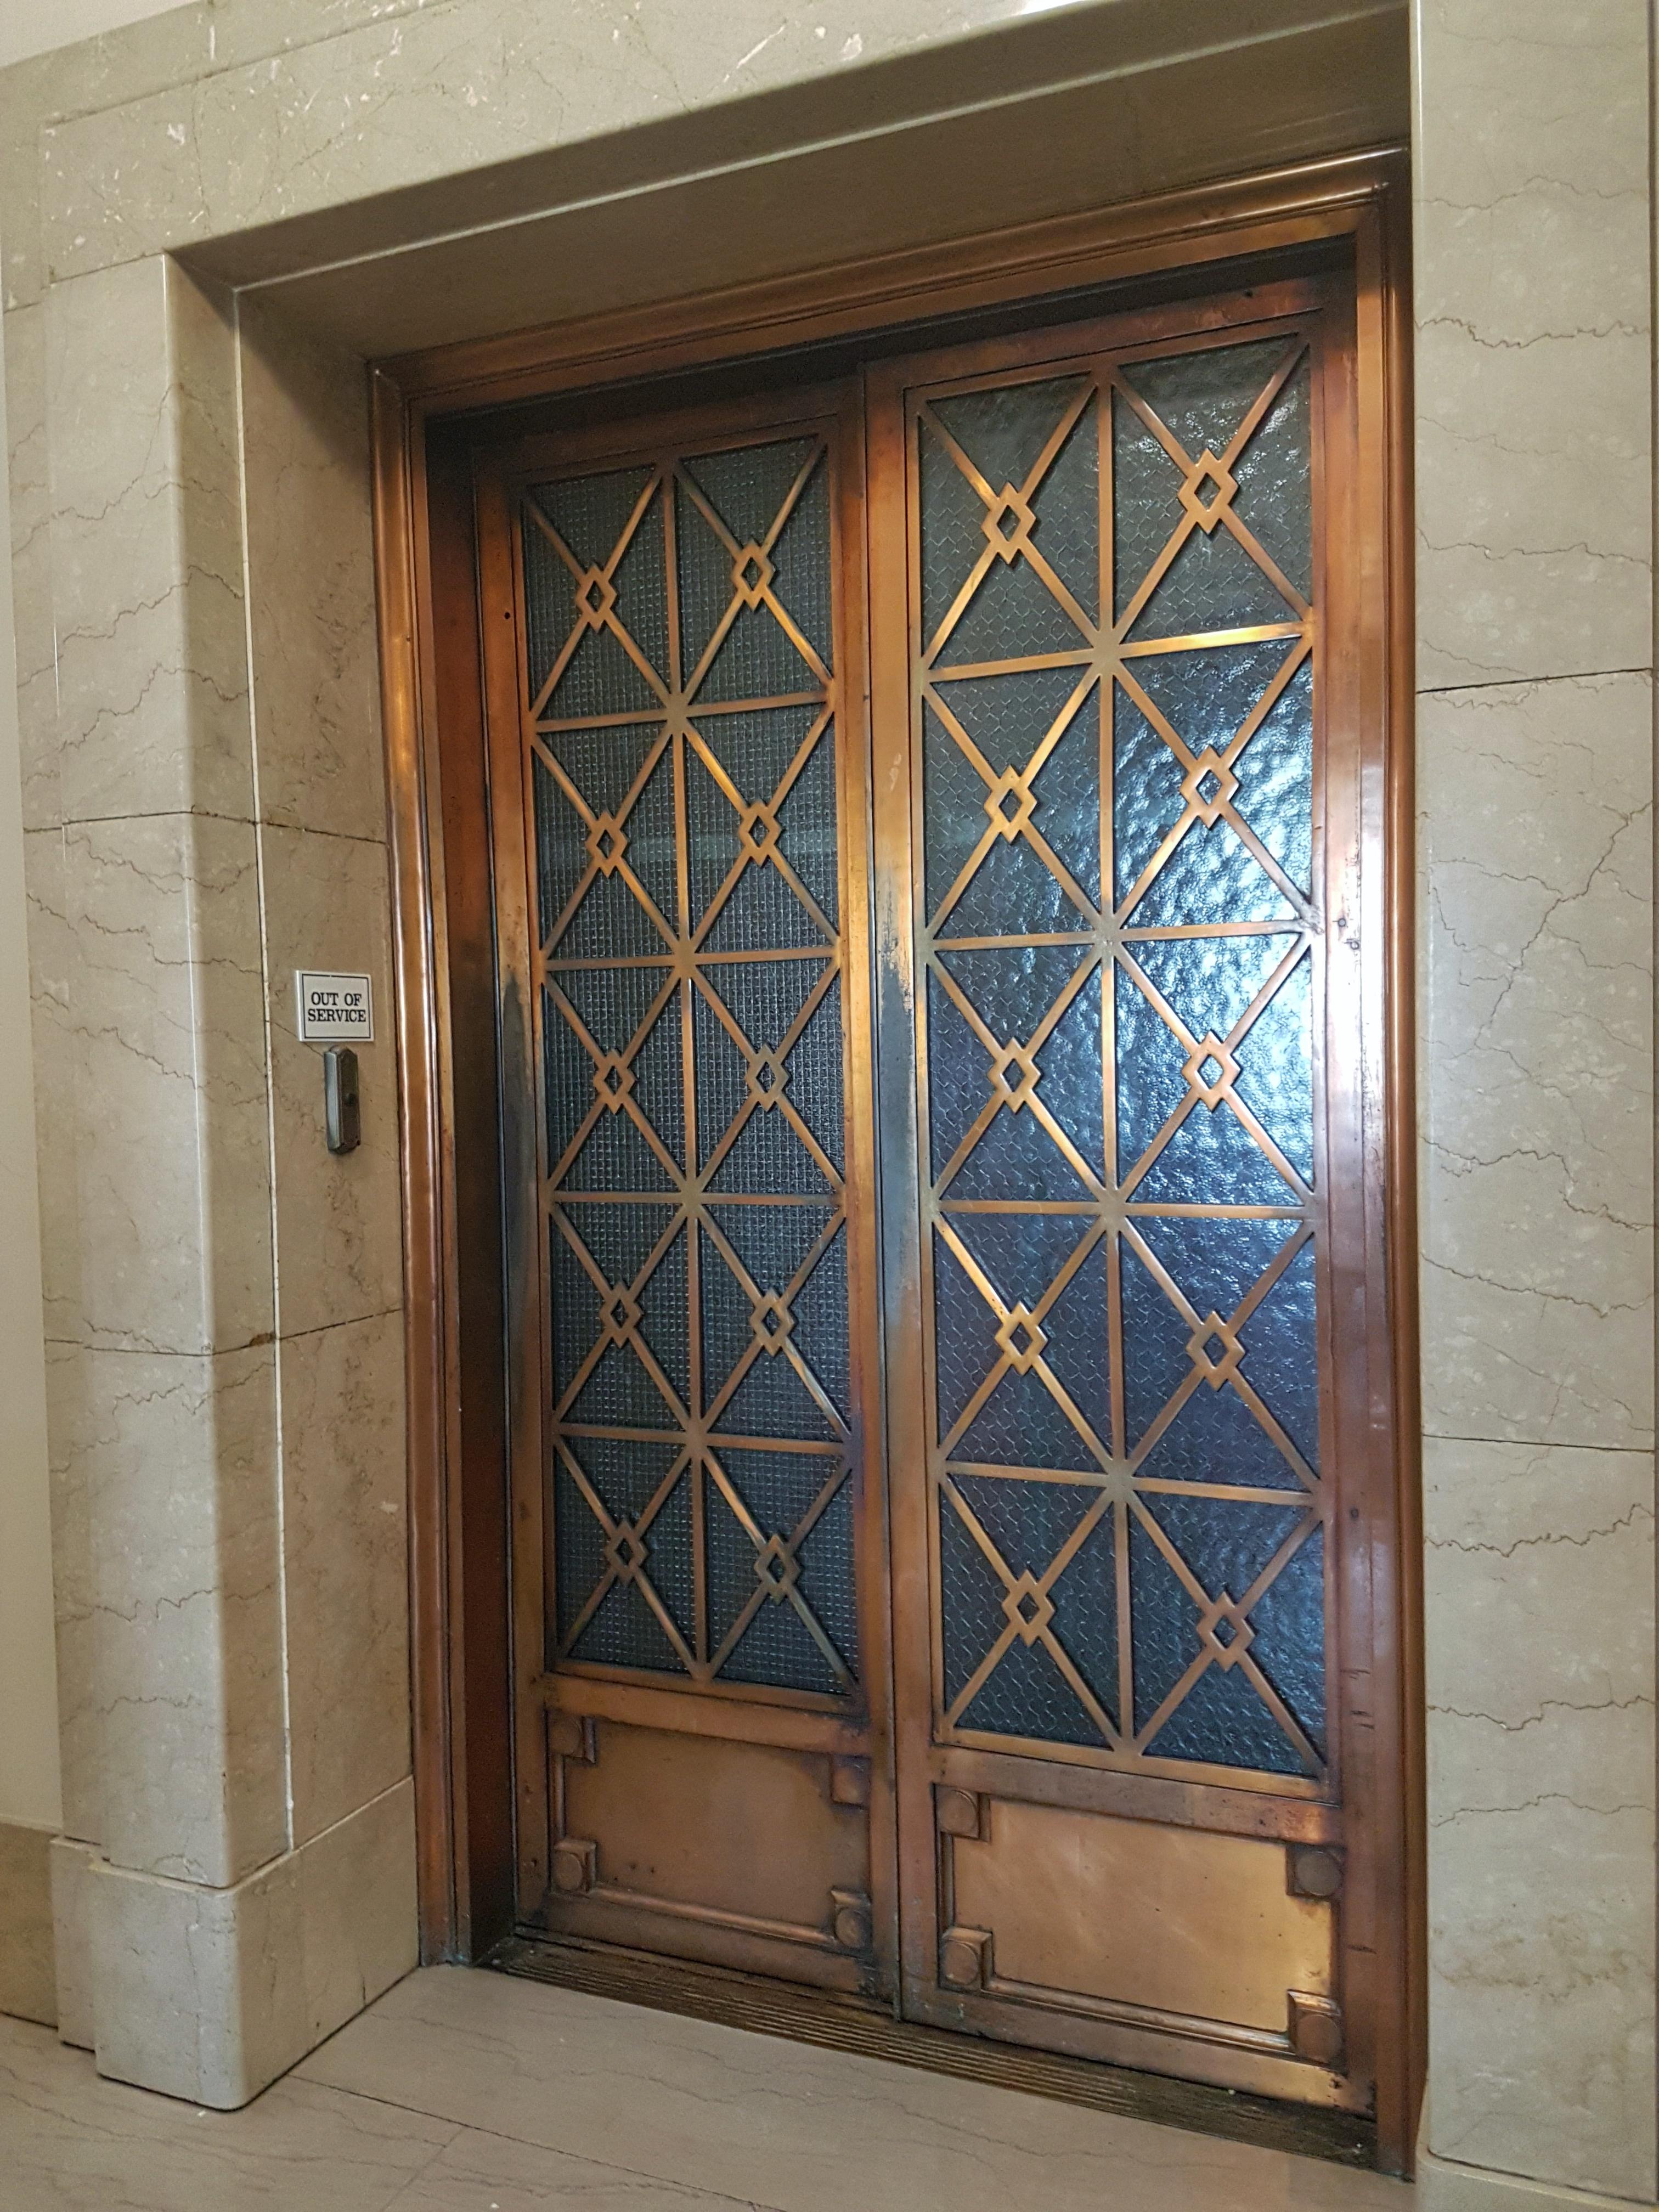 Manitoba Legislative Building Art Deco Elevator